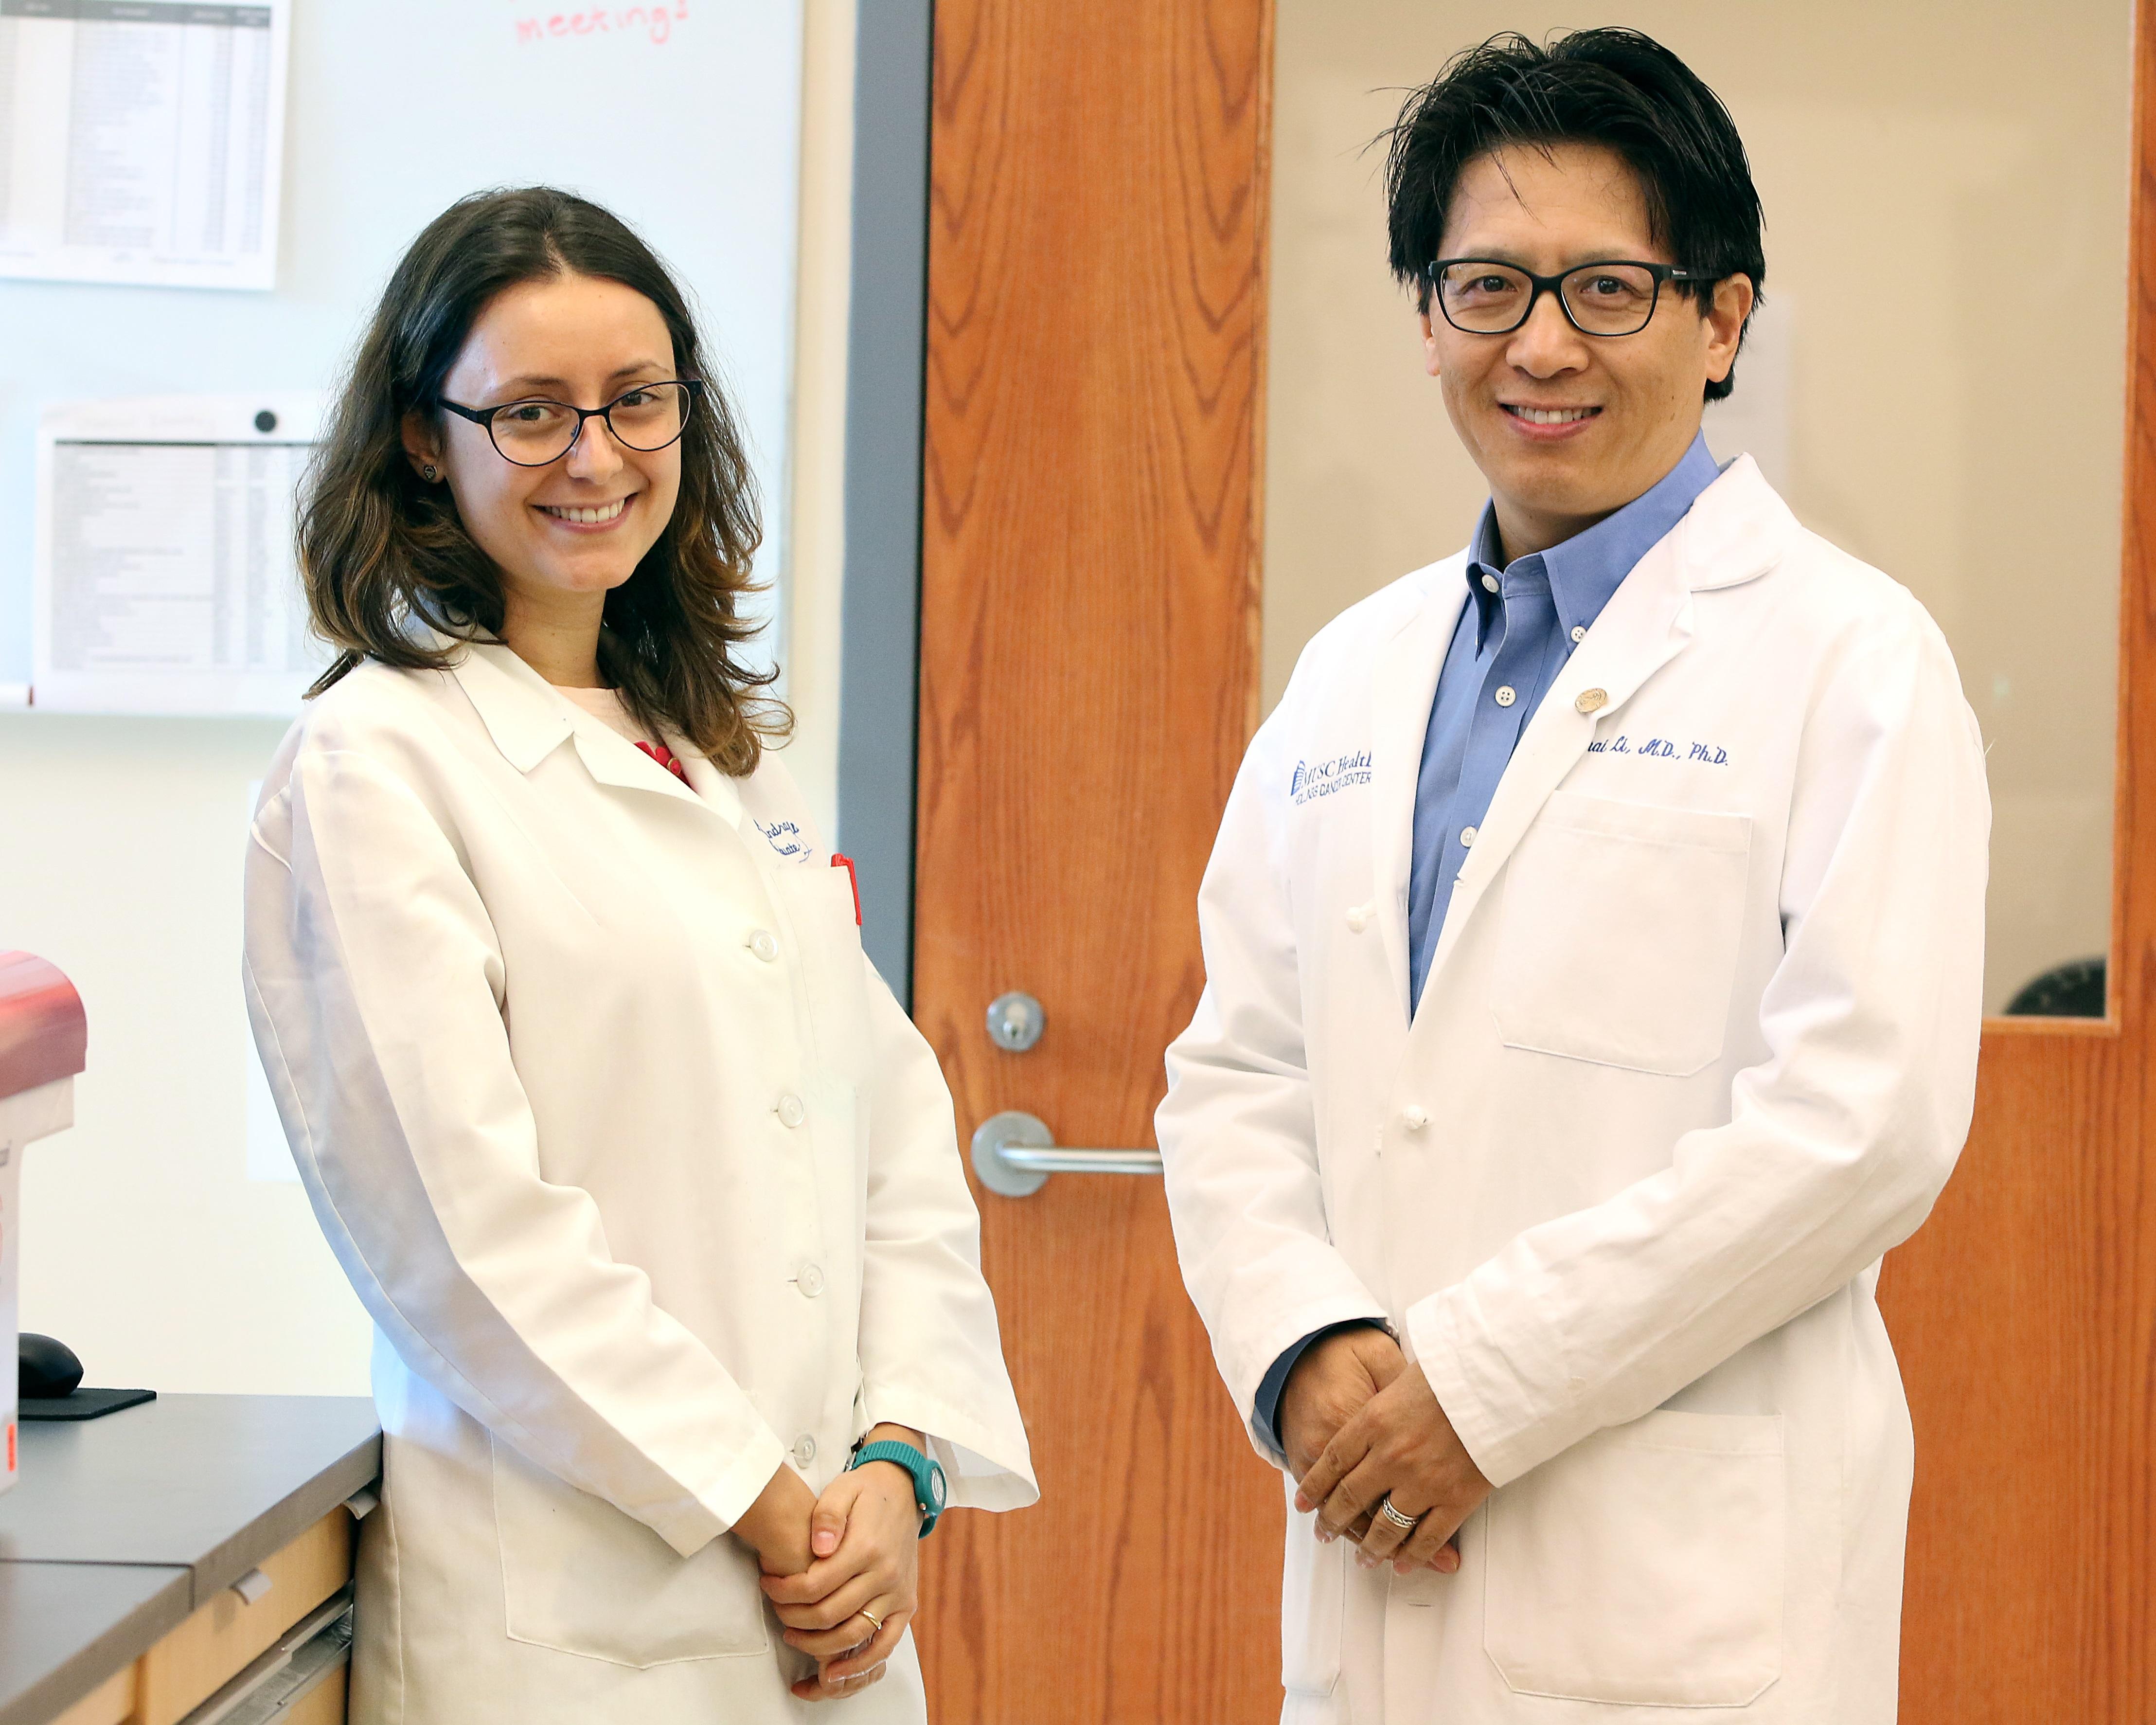 Alessandra Metelli (left) and Dr. Zihai Li (right), Medical University of South Carolina